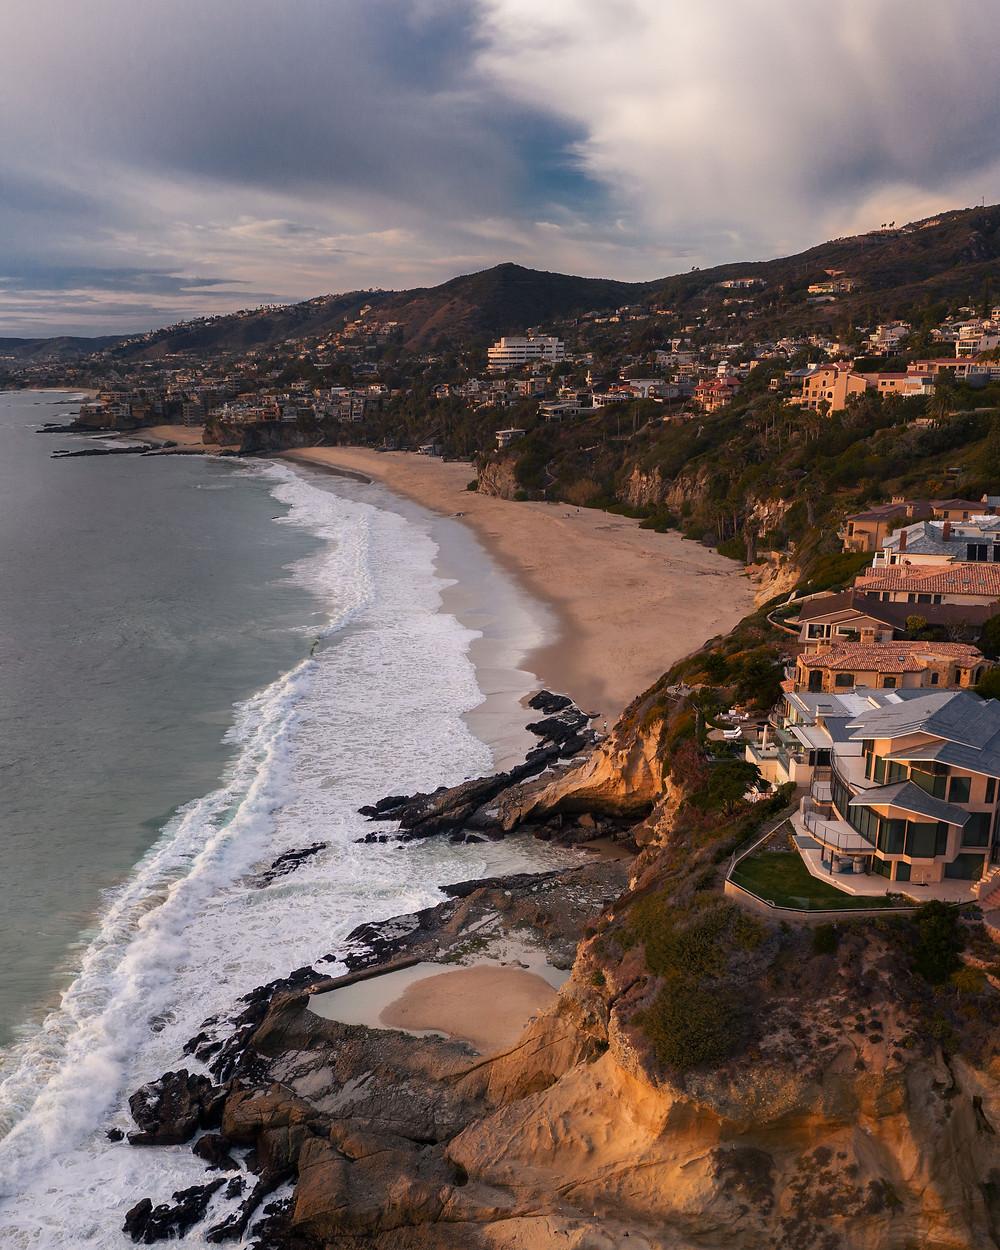 Coastline view of the beautiful beach and mountains of Laguna Beach